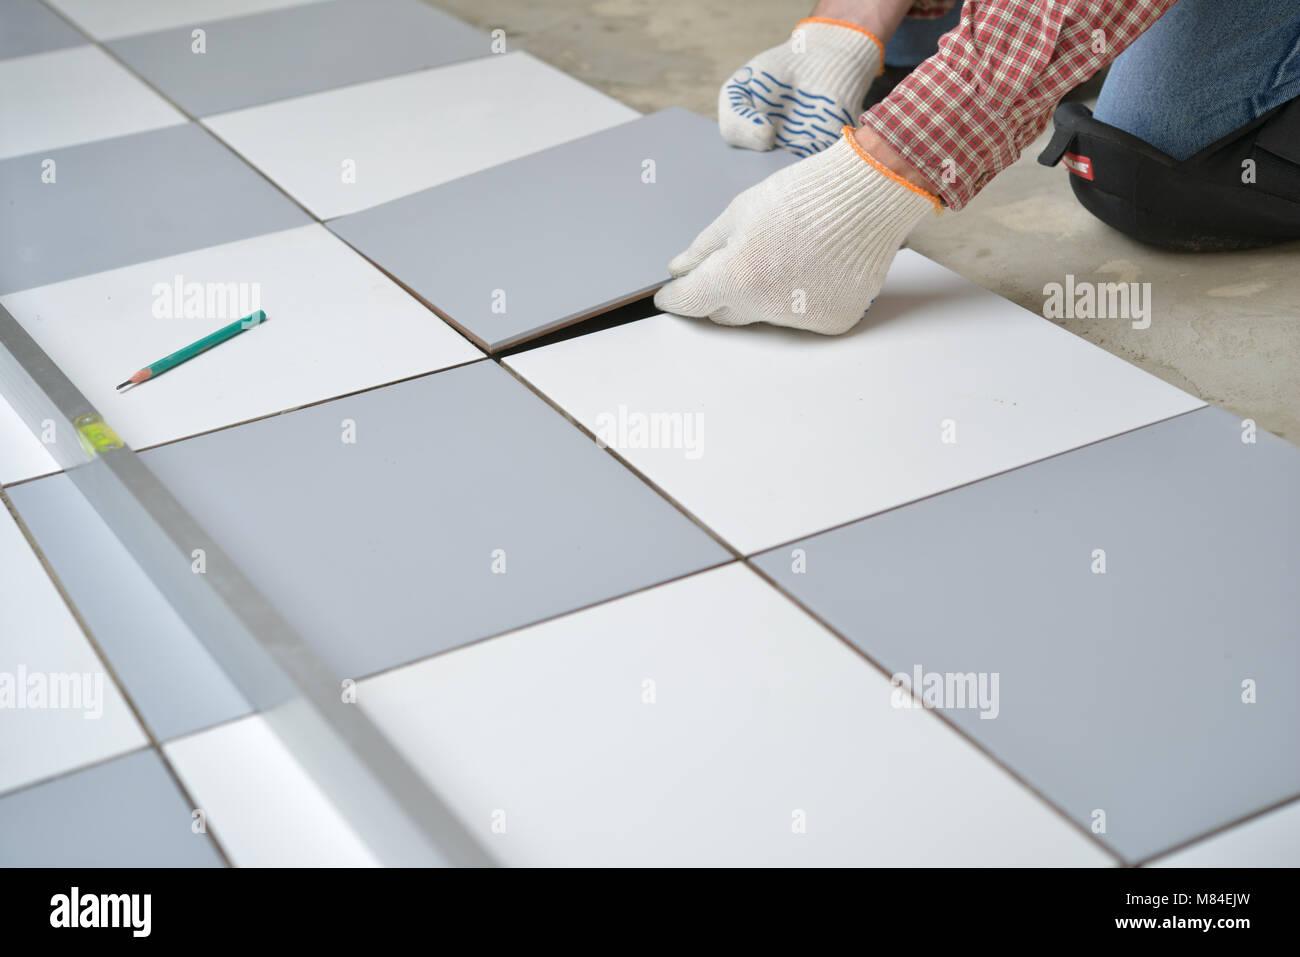 Ceramic Tiles Tools Tiler Floor Stock Photos & Ceramic Tiles Tools ...